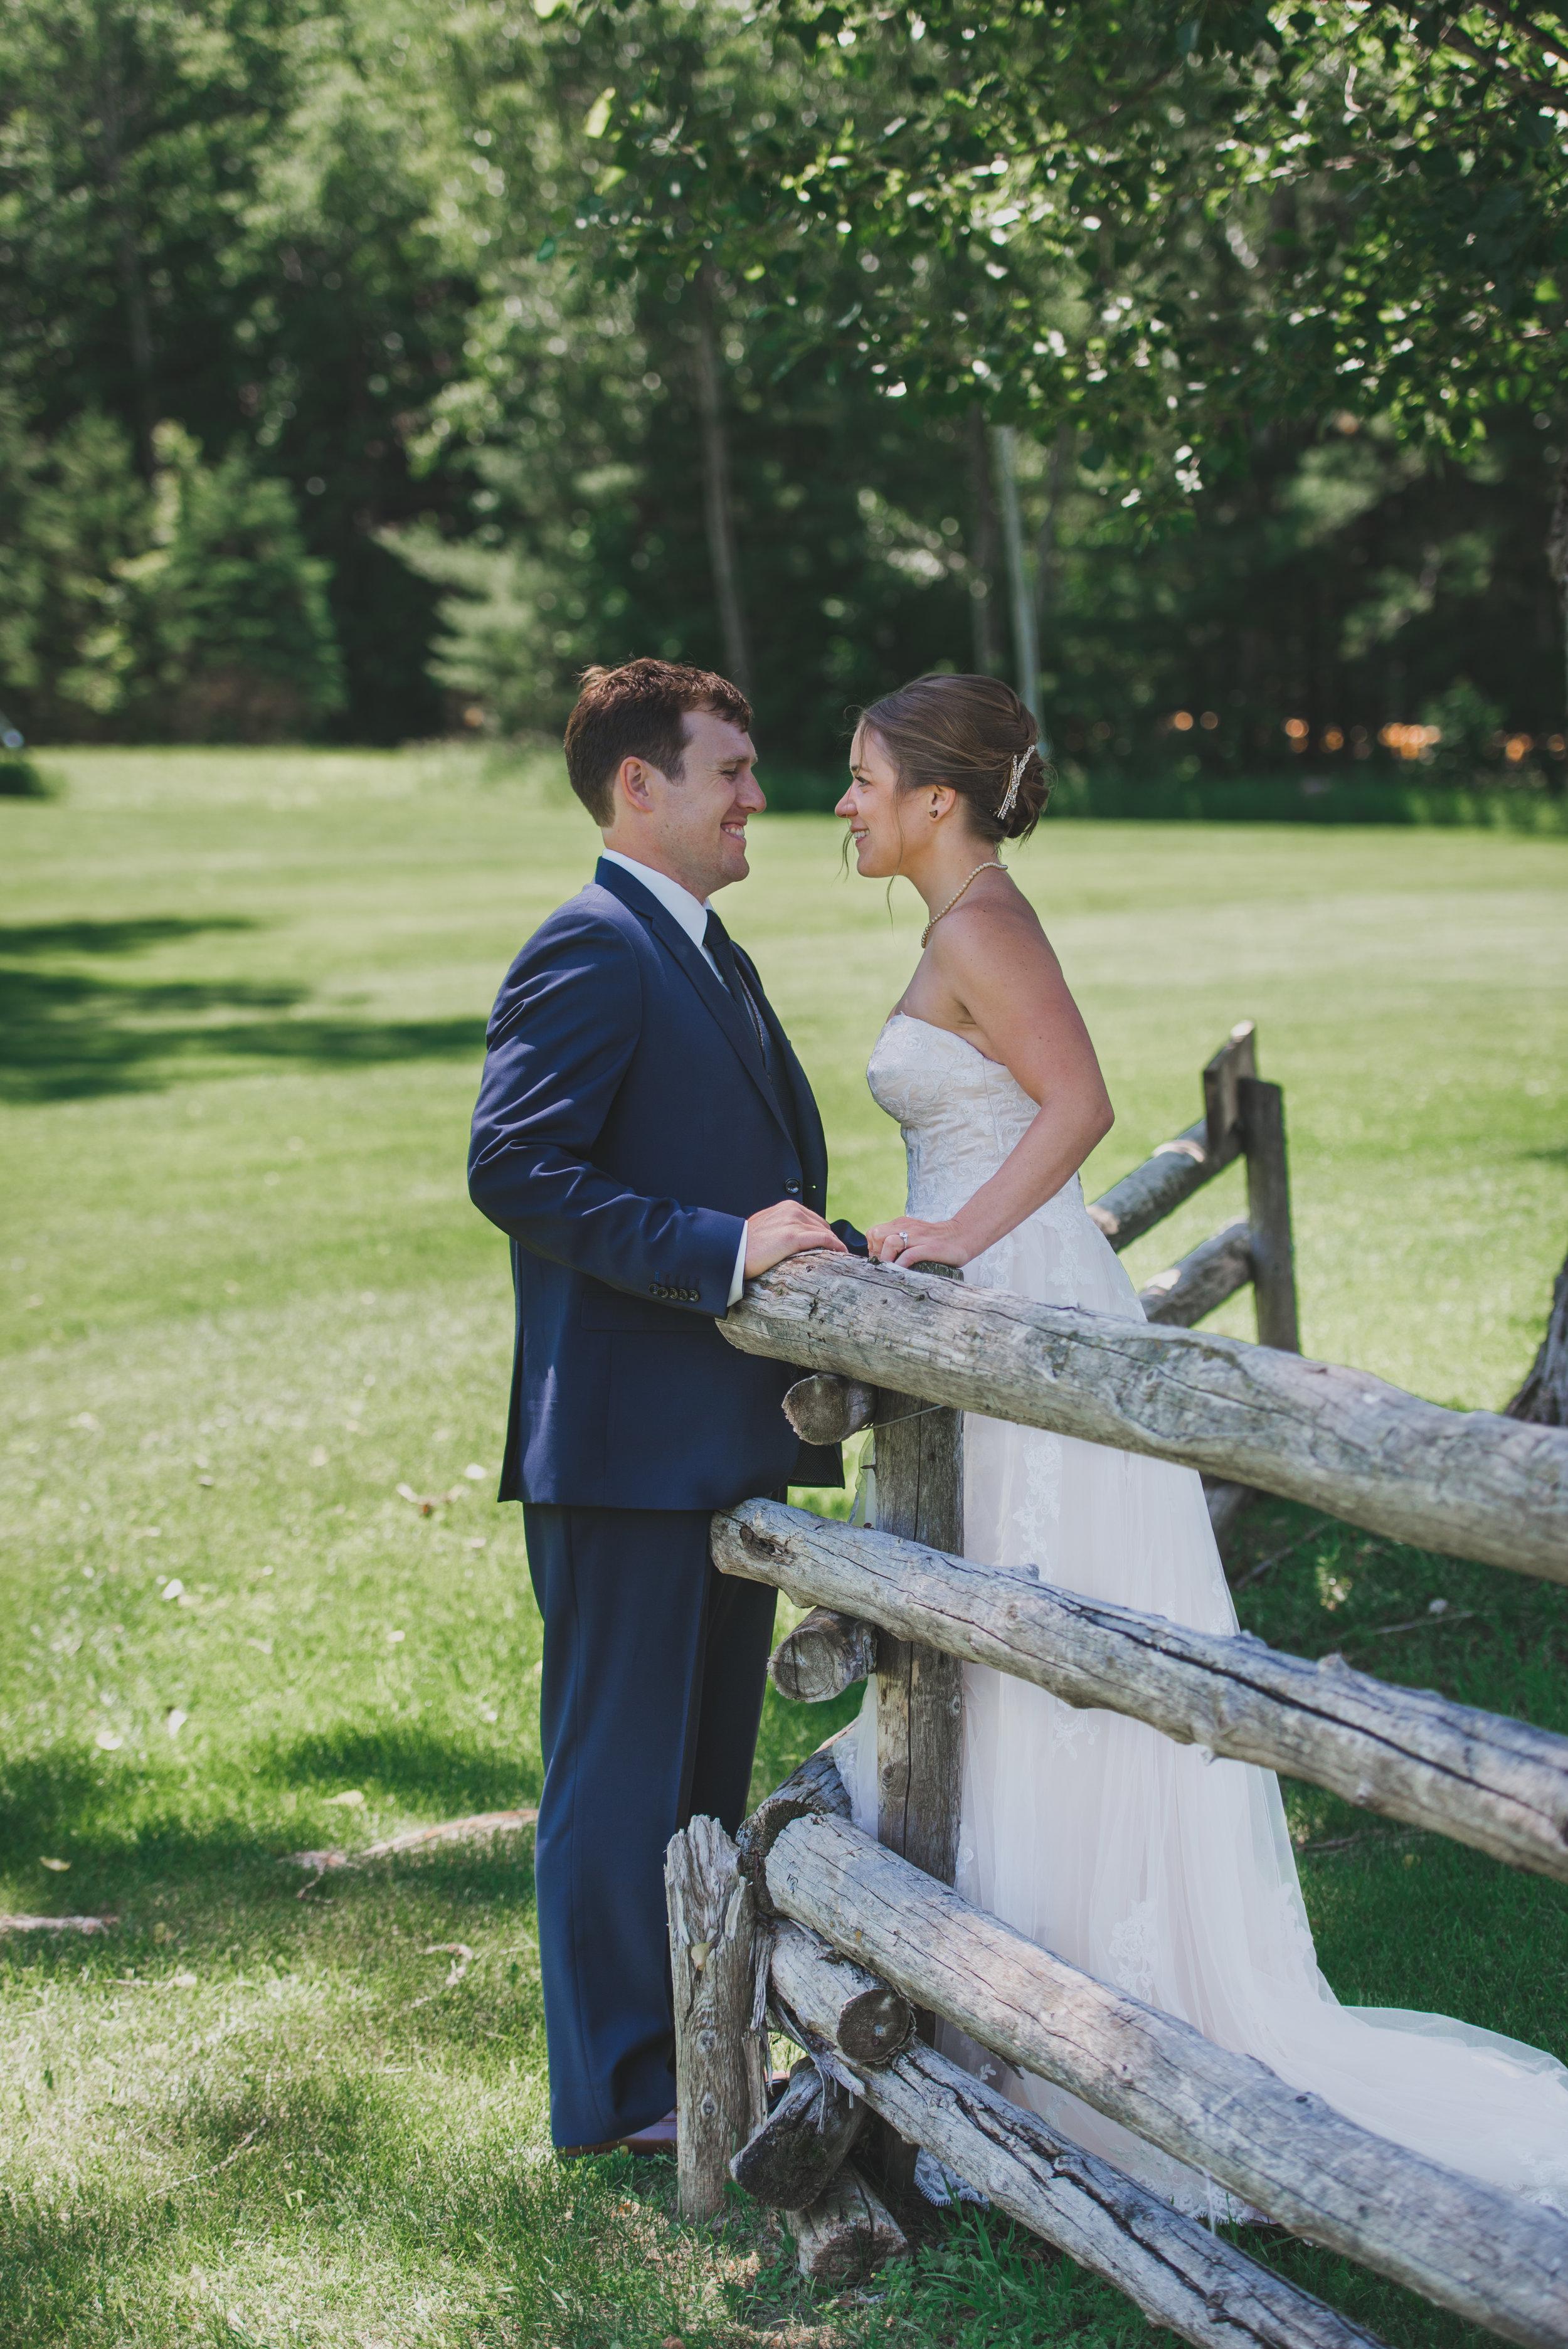 SheriCorey-Wedding-June242017-FirstLook-PortraitSession-00093.jpg